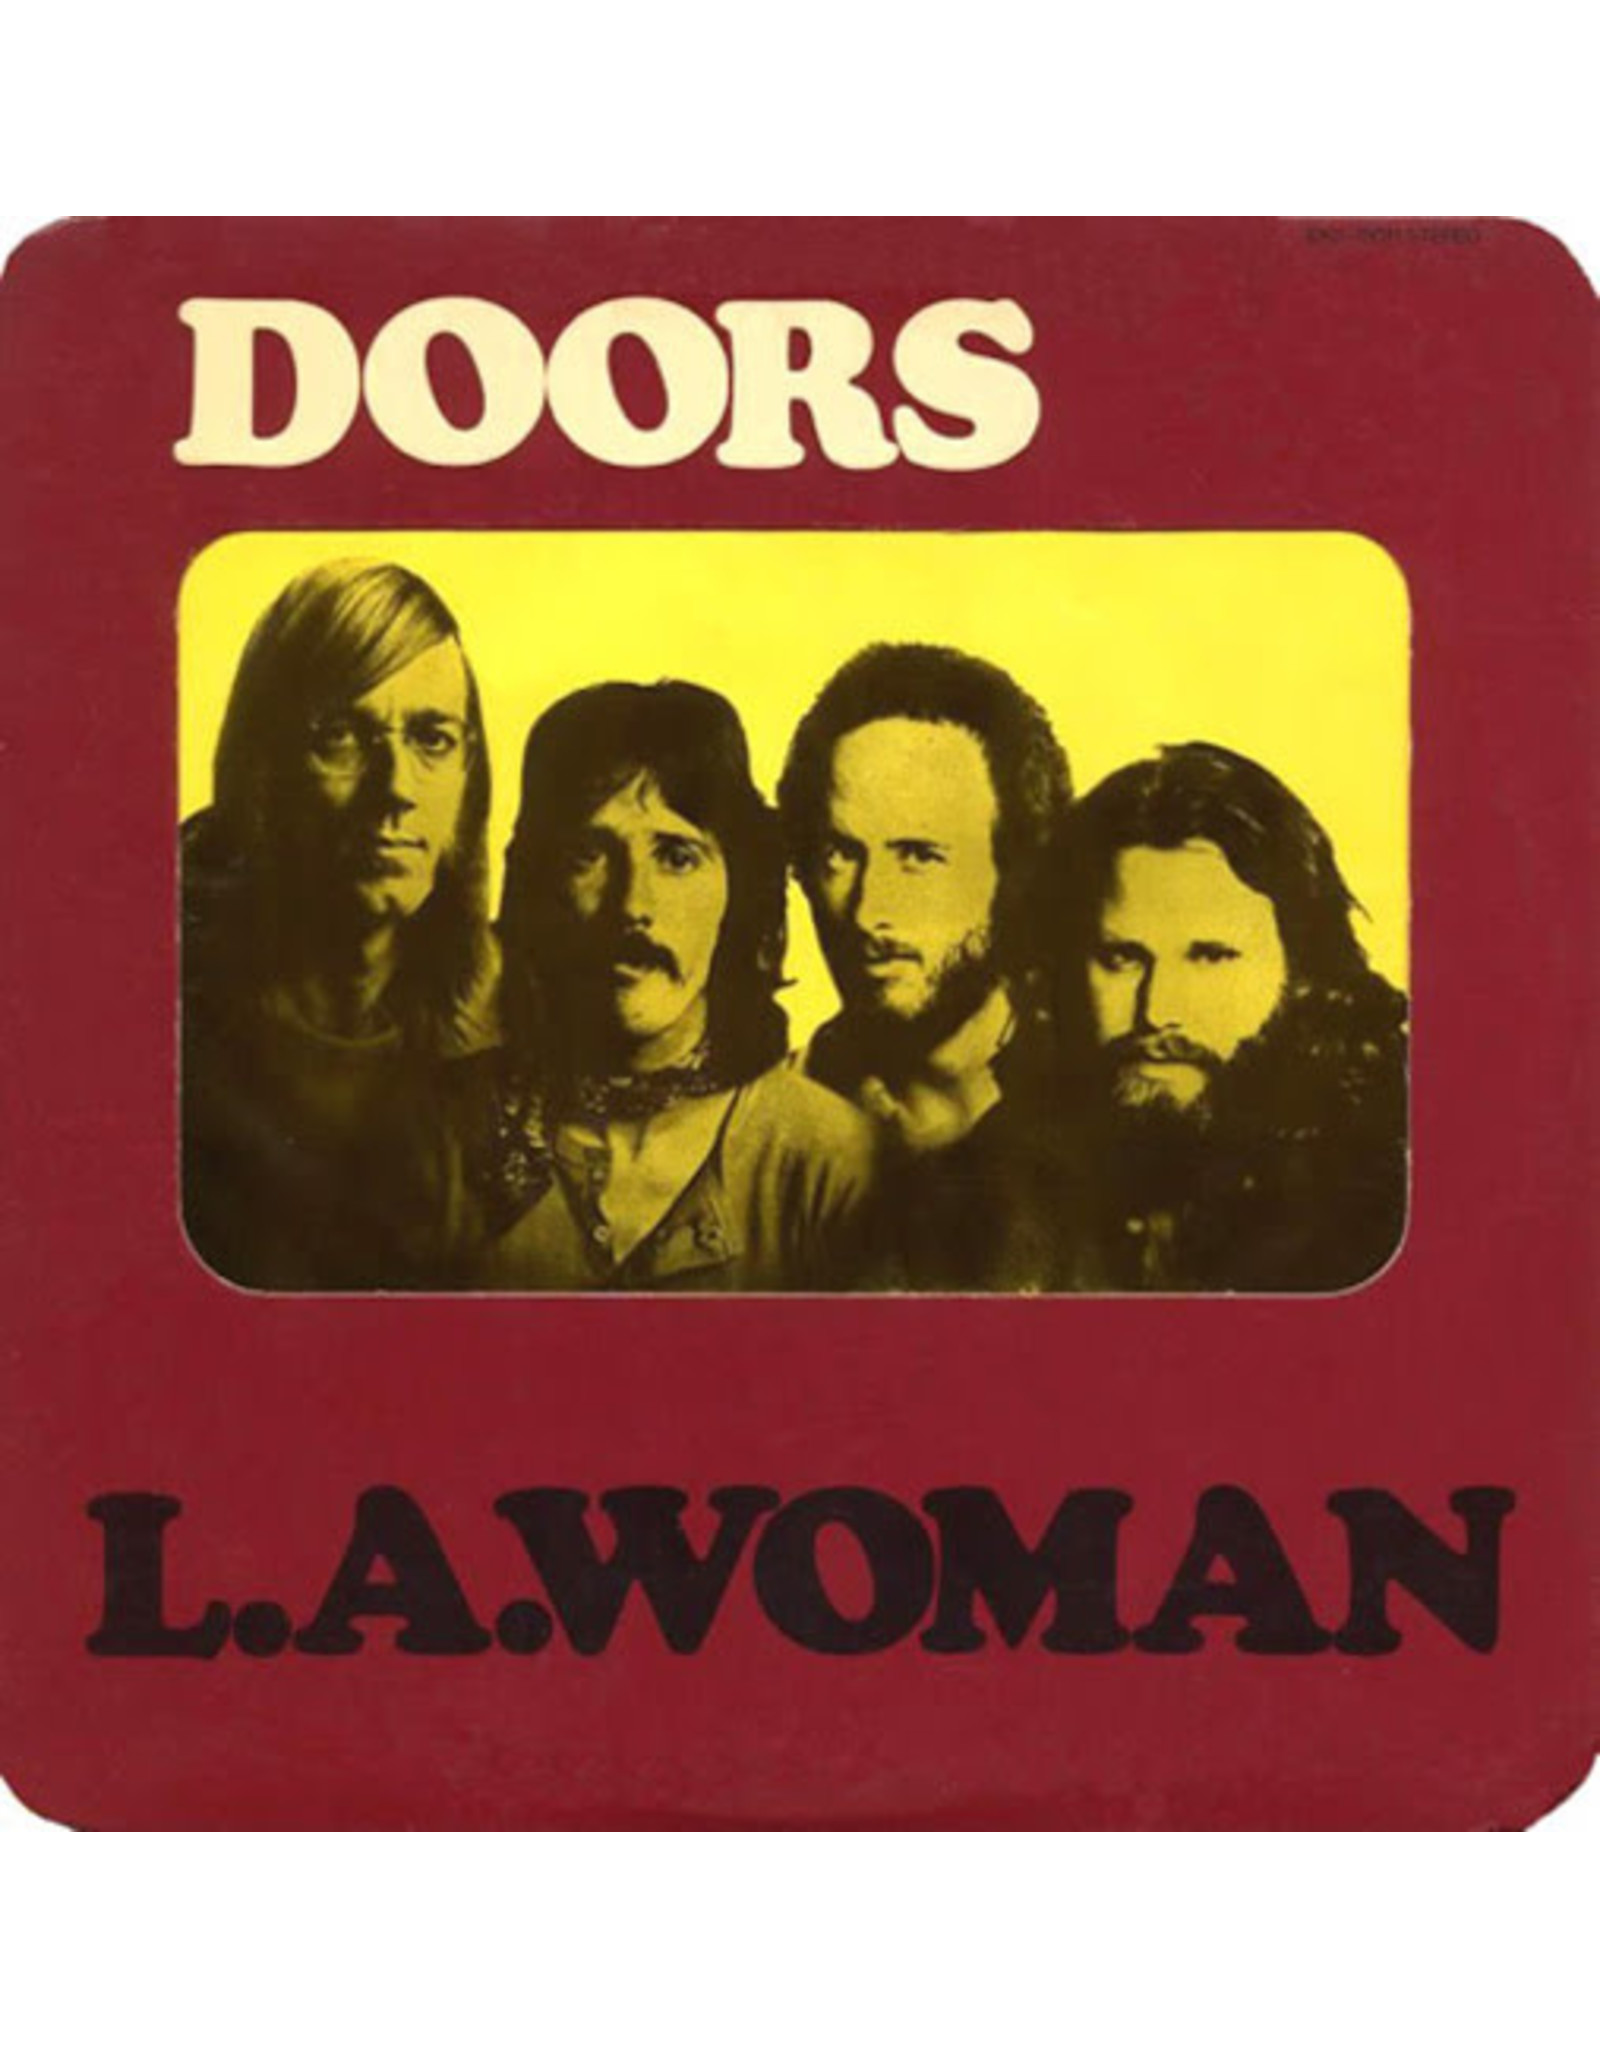 Doors - LA Woman LP